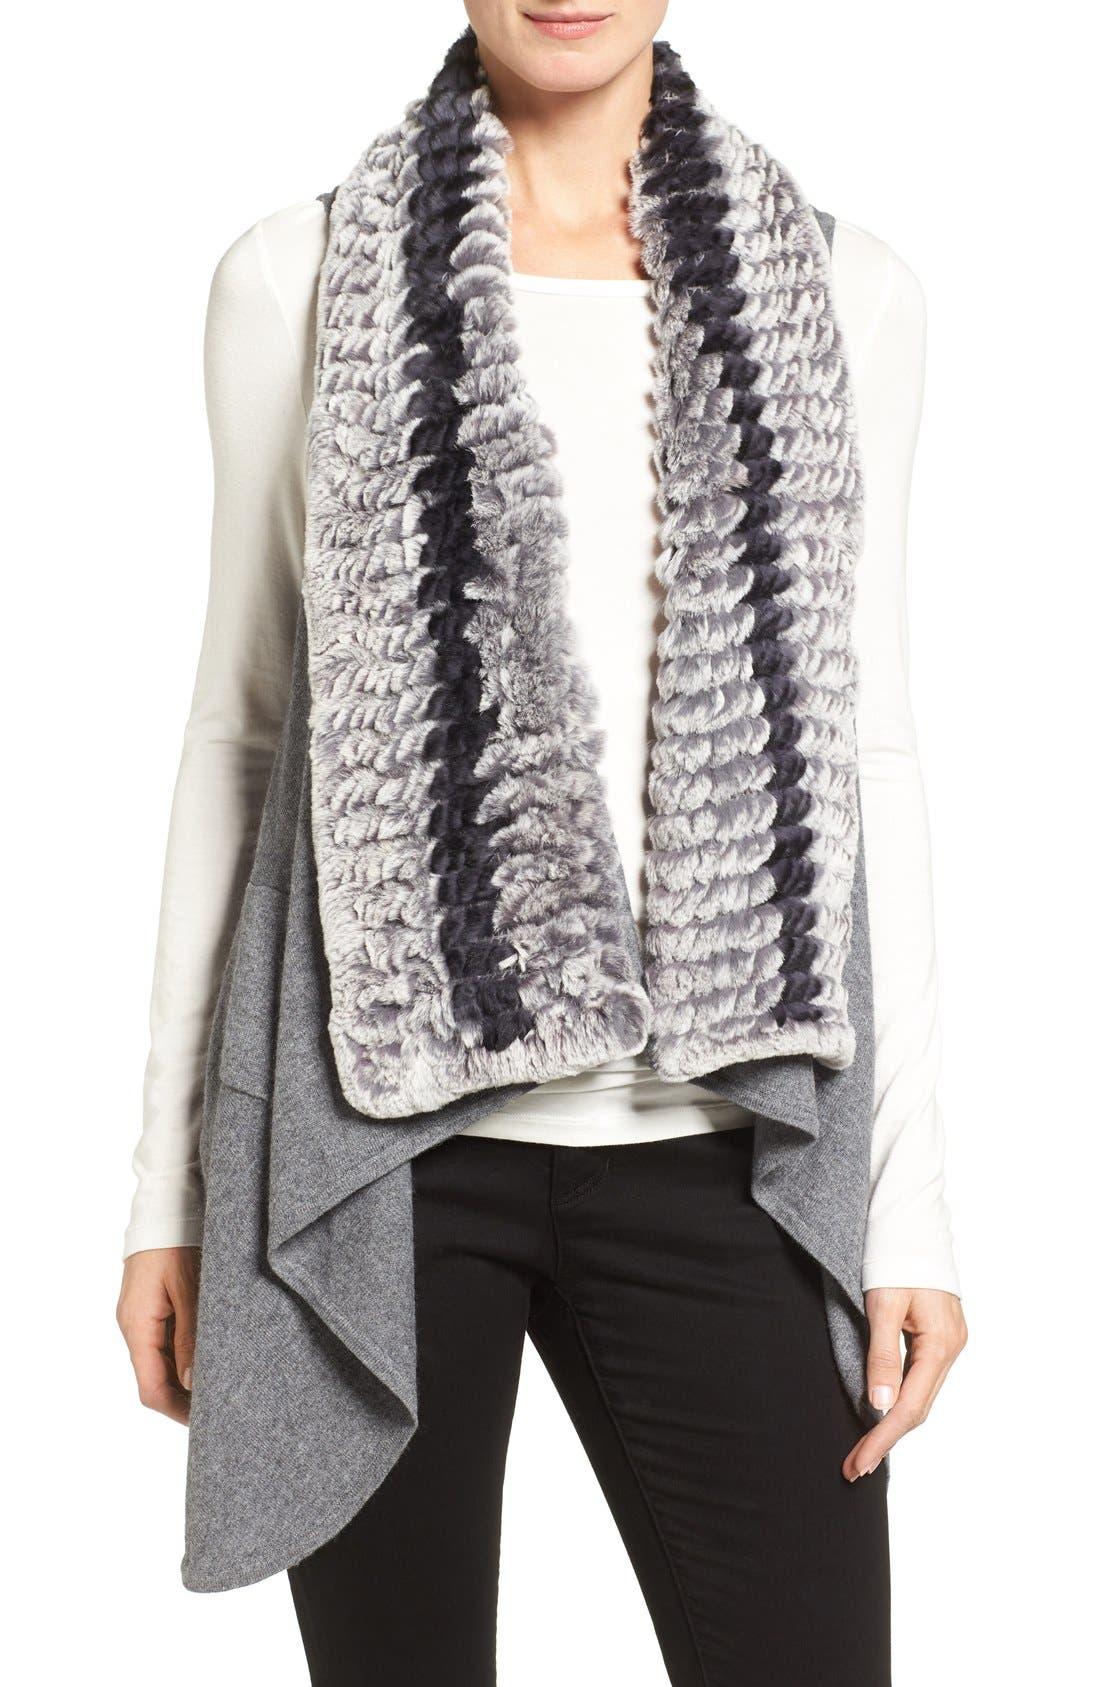 Alternate Image 1 Selected - Belle Fare Cashmere Drape Vest with Genuine Rex Rabbit Fur Trim